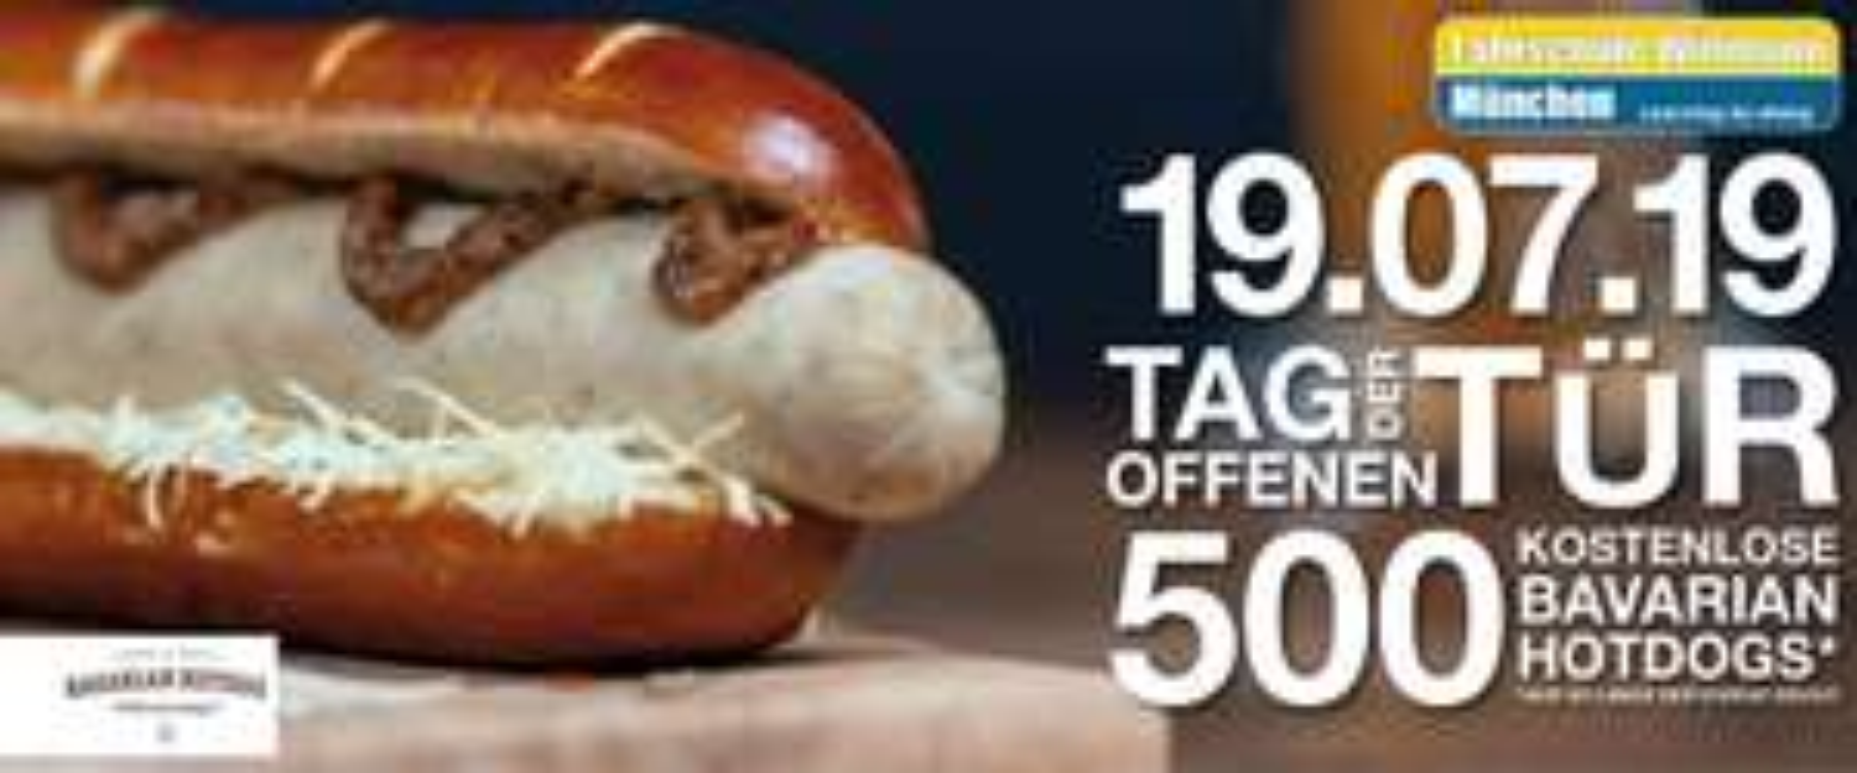 [ München ] 500 kostenlose Bavarian Hot Dogs am 19.07. ab 11 Uhr @ Fahrschule Wittmann